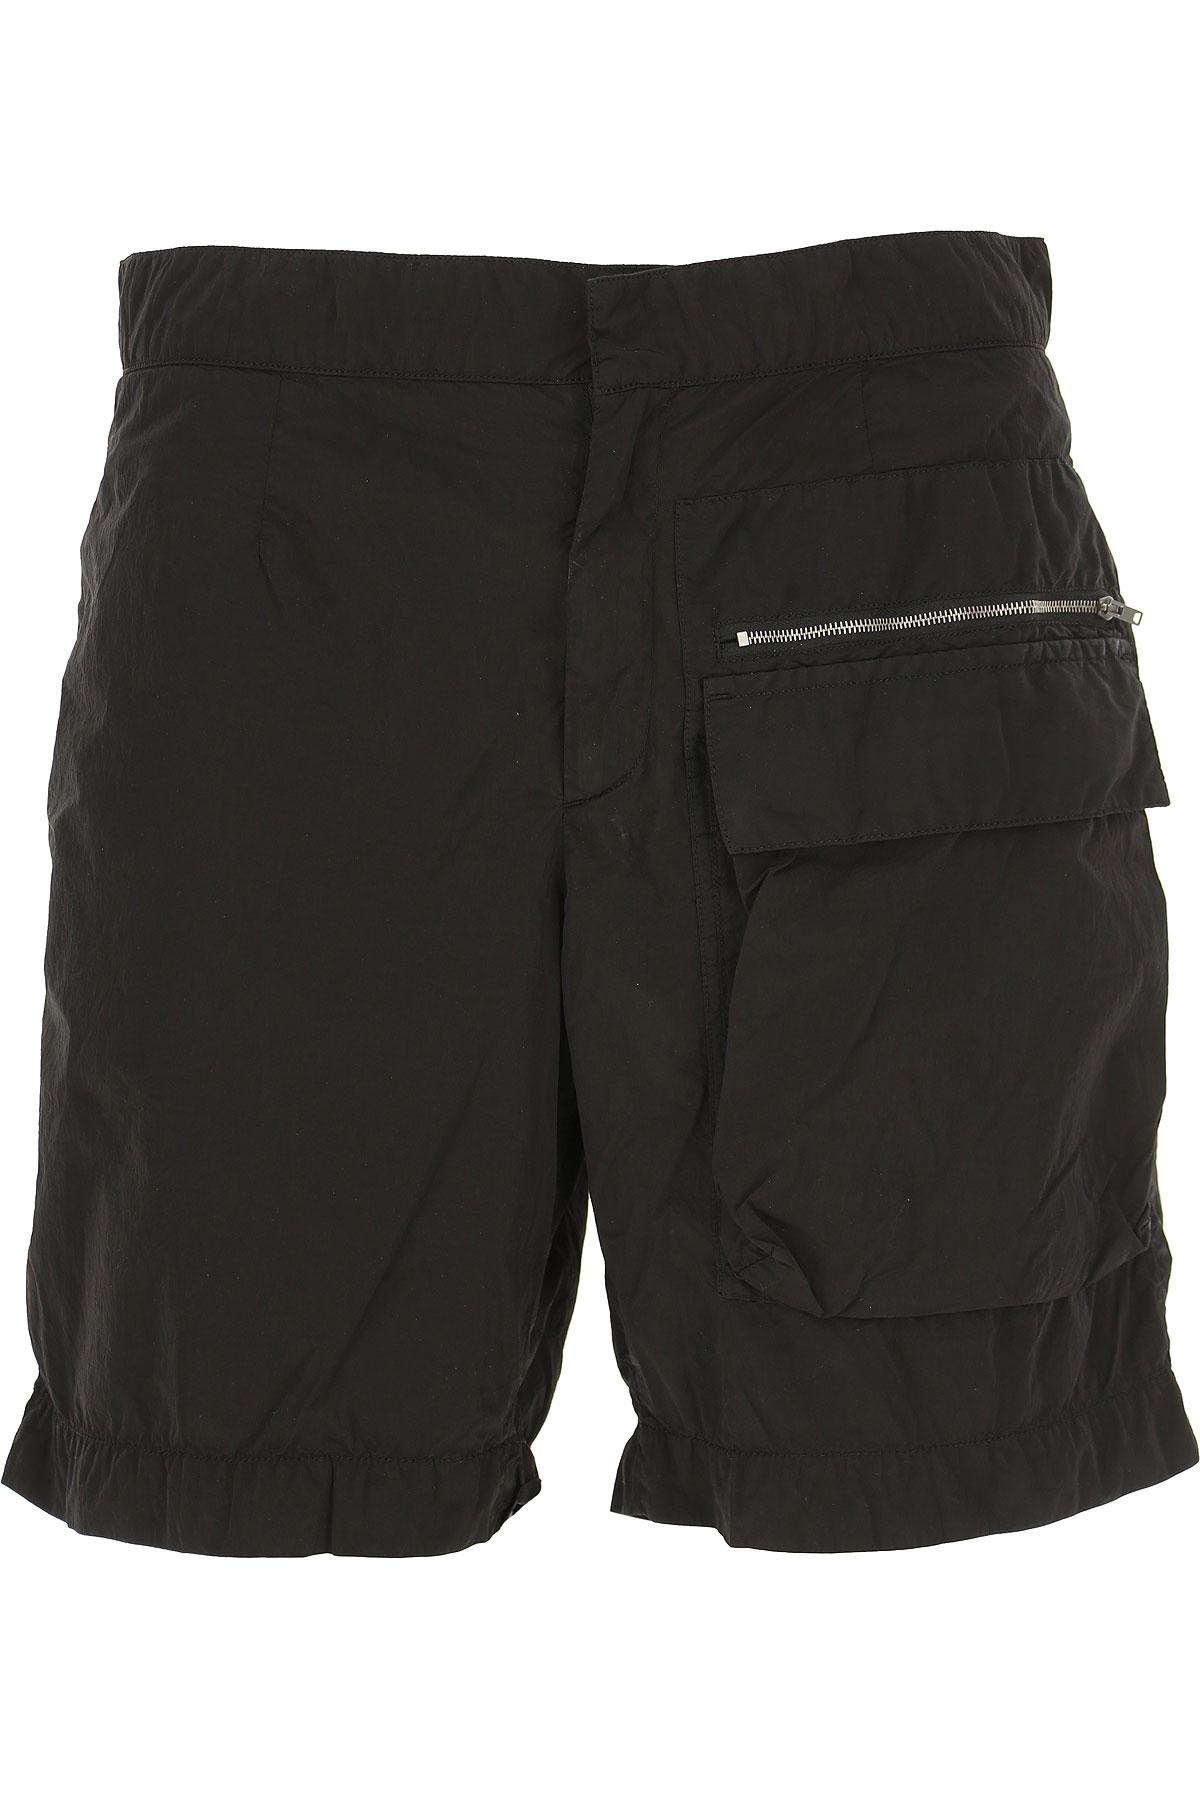 ALYX Shorts for Men On Sale in Outlet, Black, polyamide, 2019, 36 XL